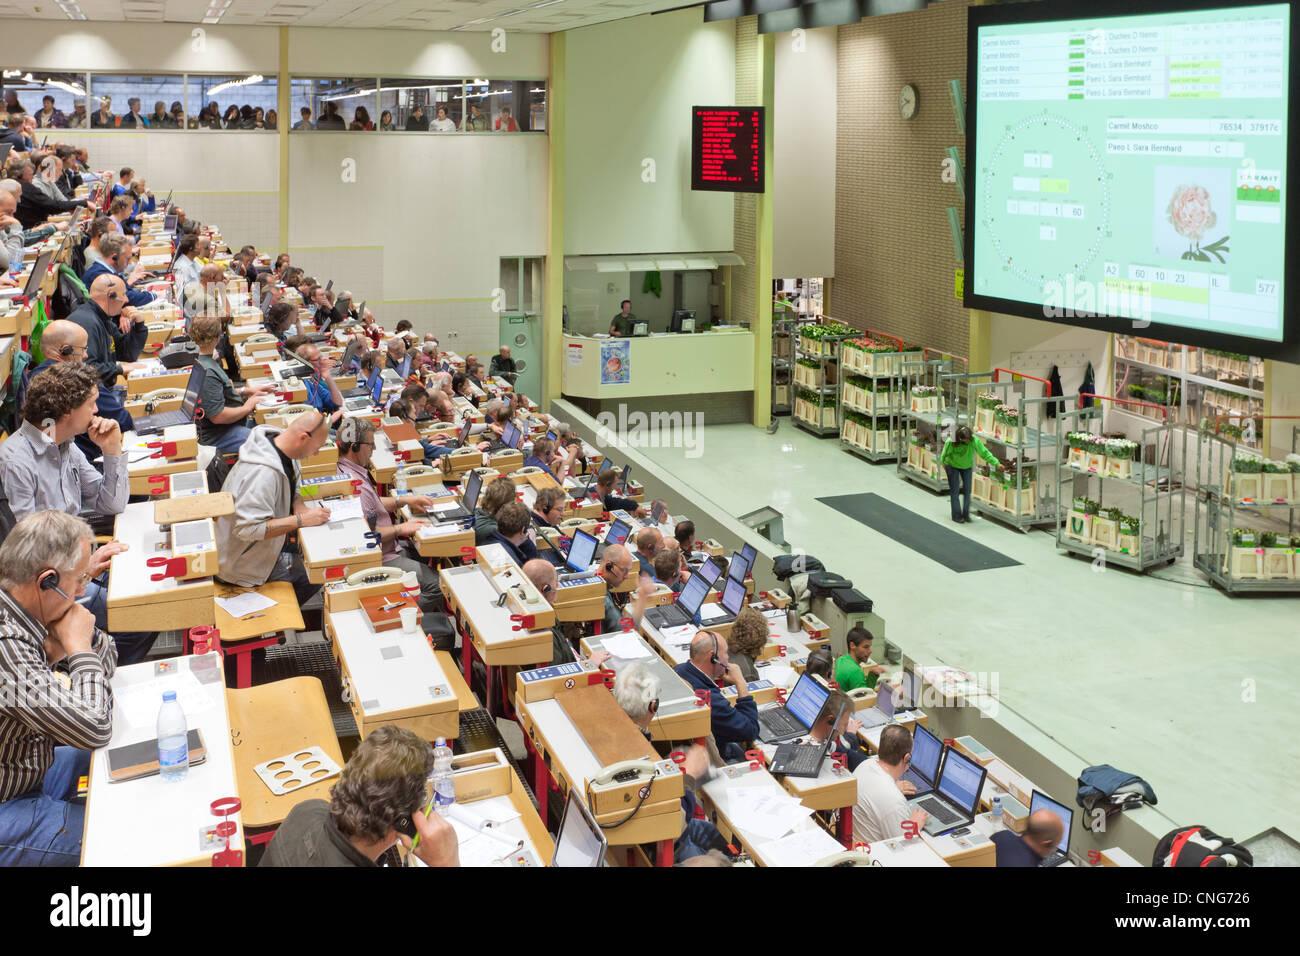 Holland, Aalsmeer, Aalsmeer flower auction, the Dutch Bloemenveiling Aalsmeer. In the auction house. - Stock Image